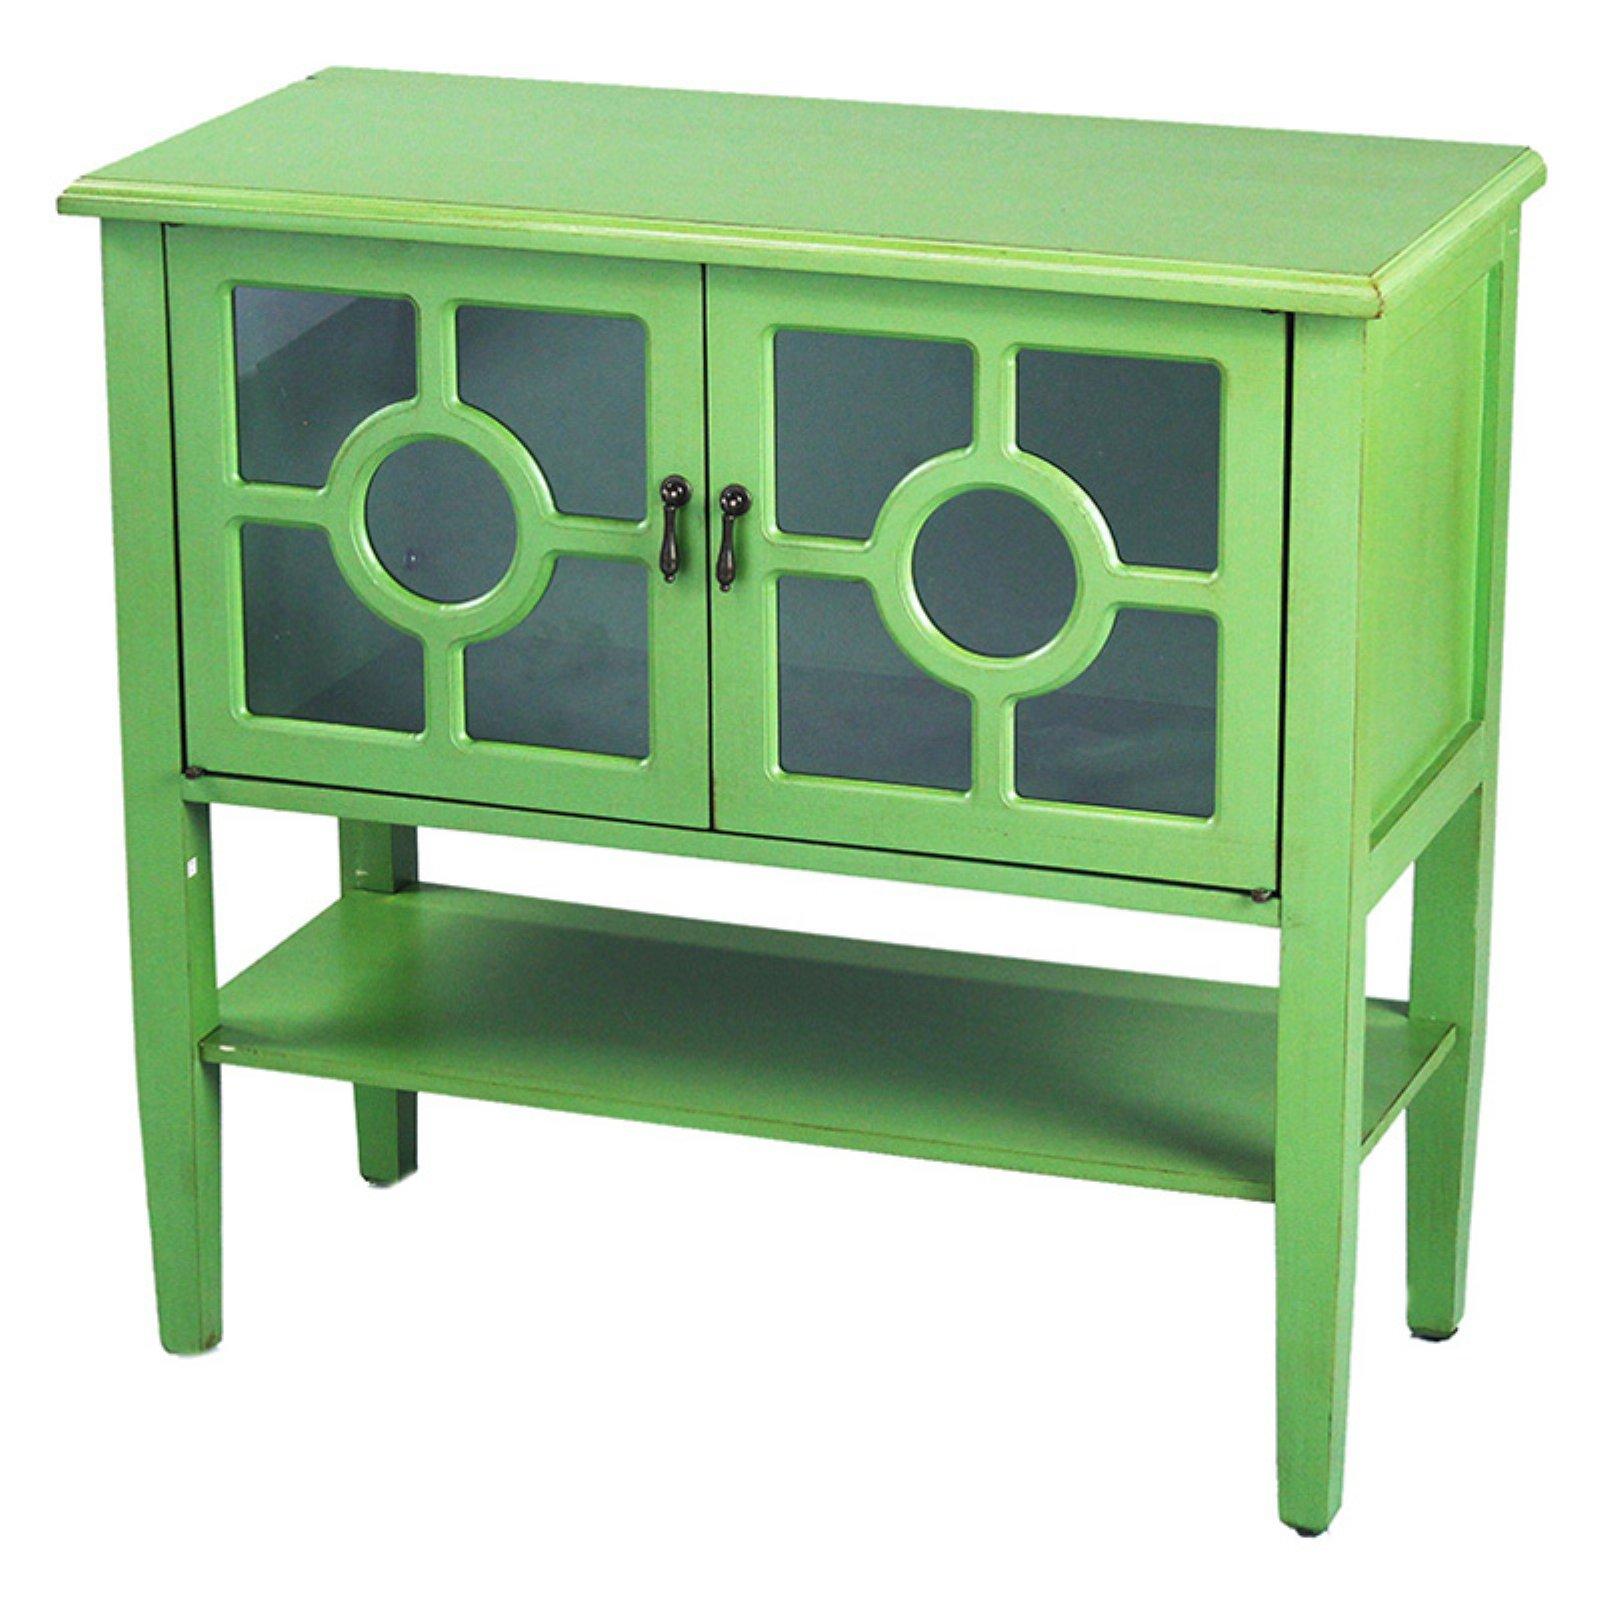 Heather Ann Creations Hampton Lattice Glass Console Cabinet